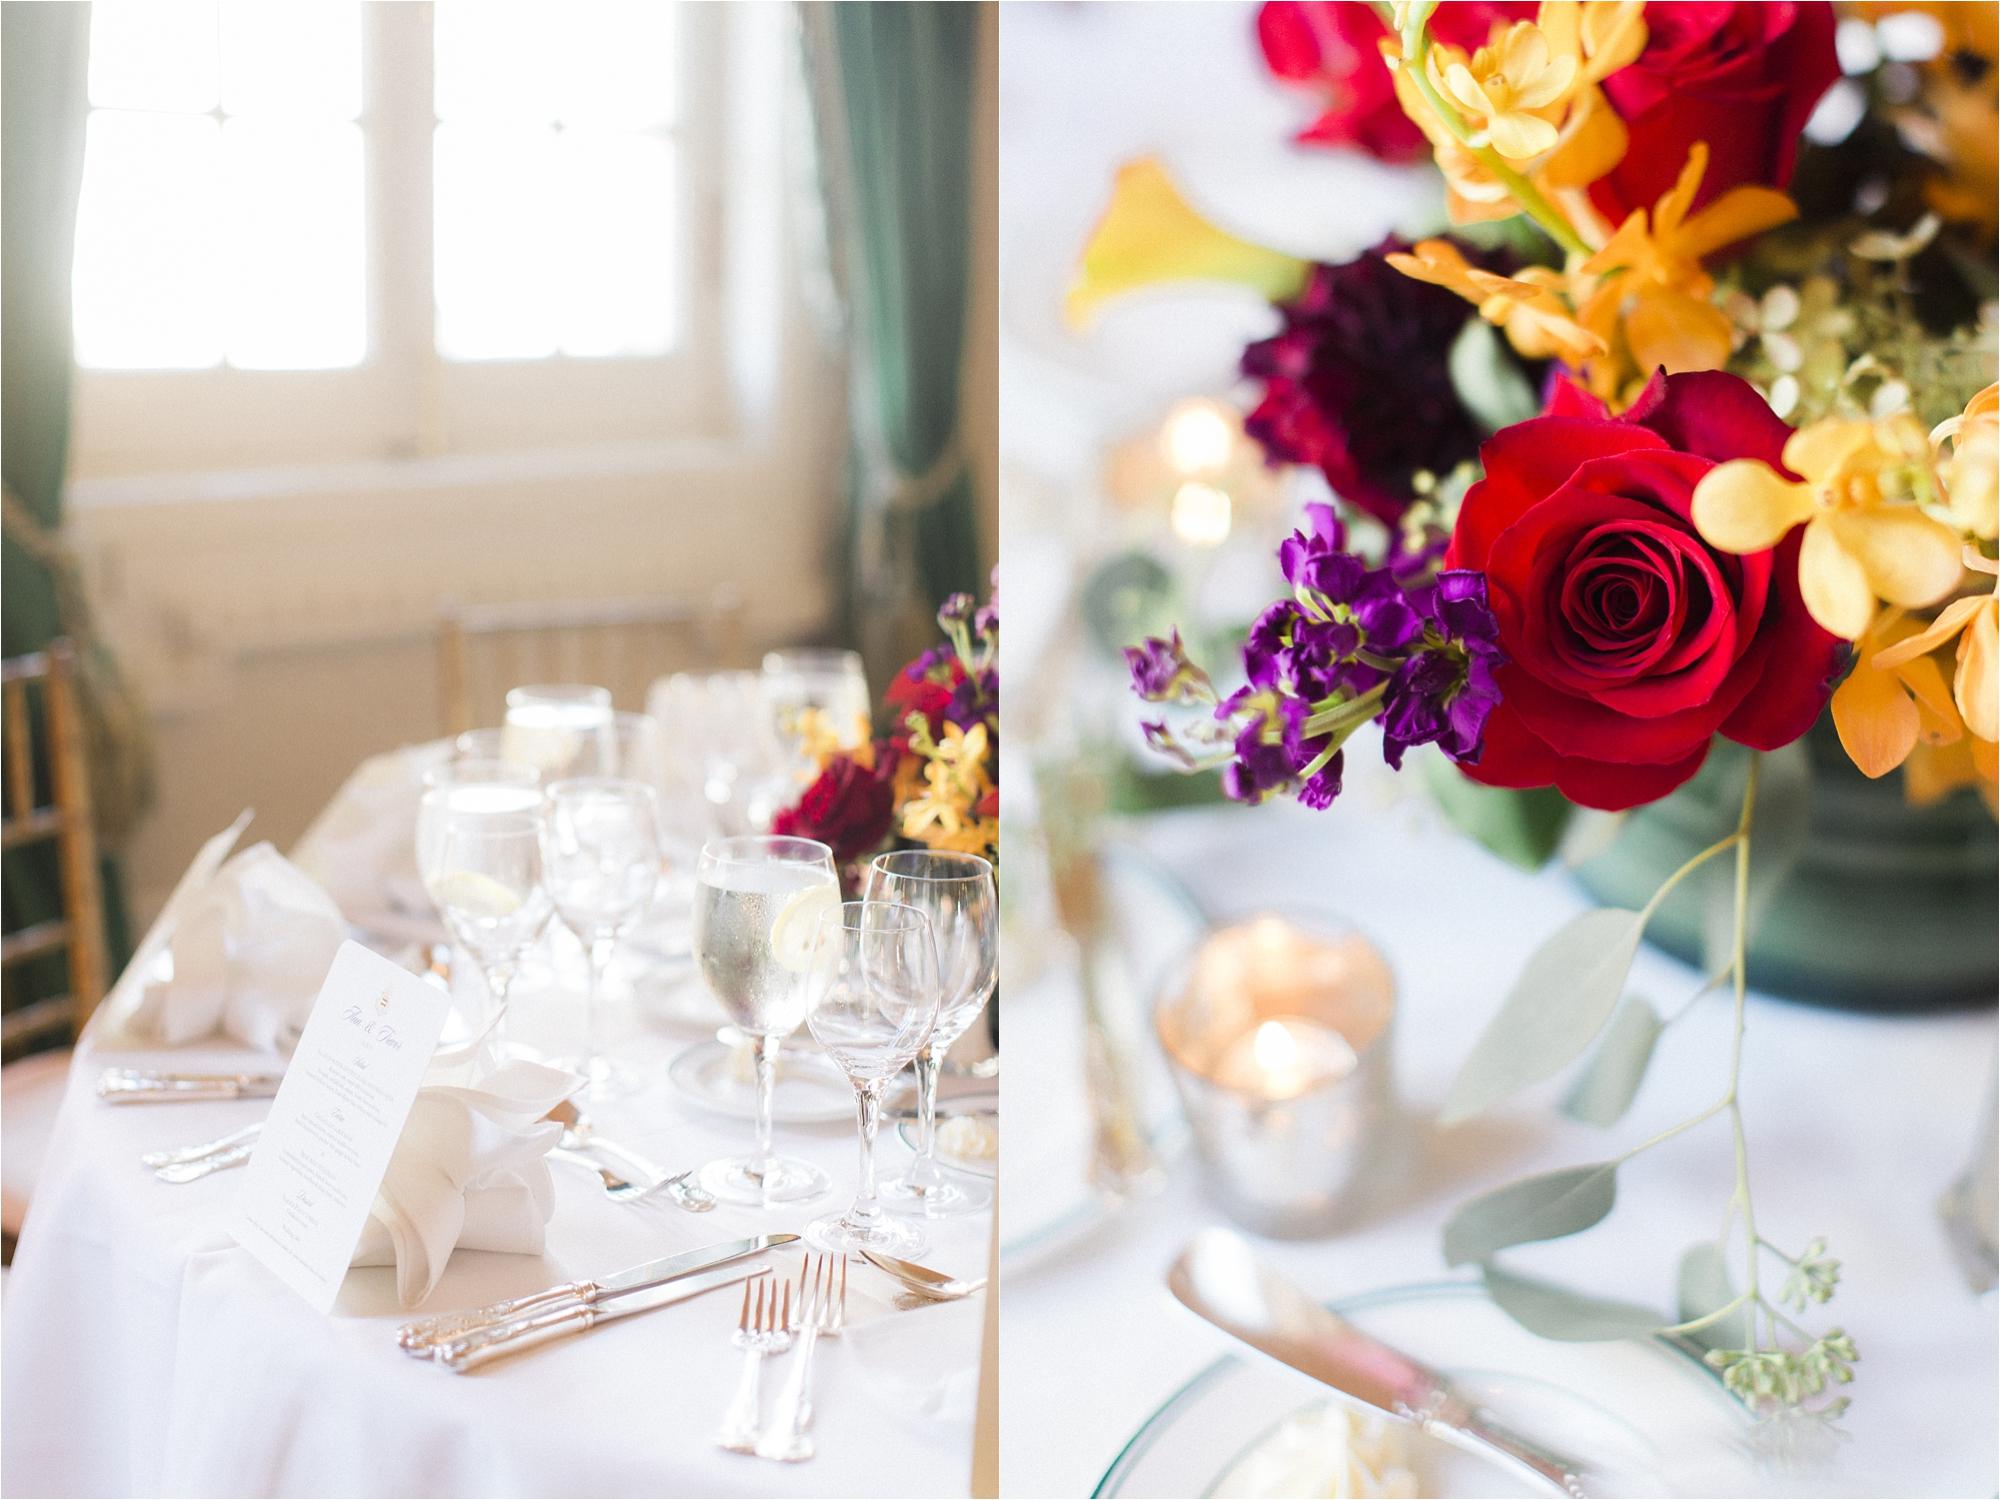 stephanie-yonce-photography-elegant-private-club-washington-dc-wedding-photos_0036.jpg